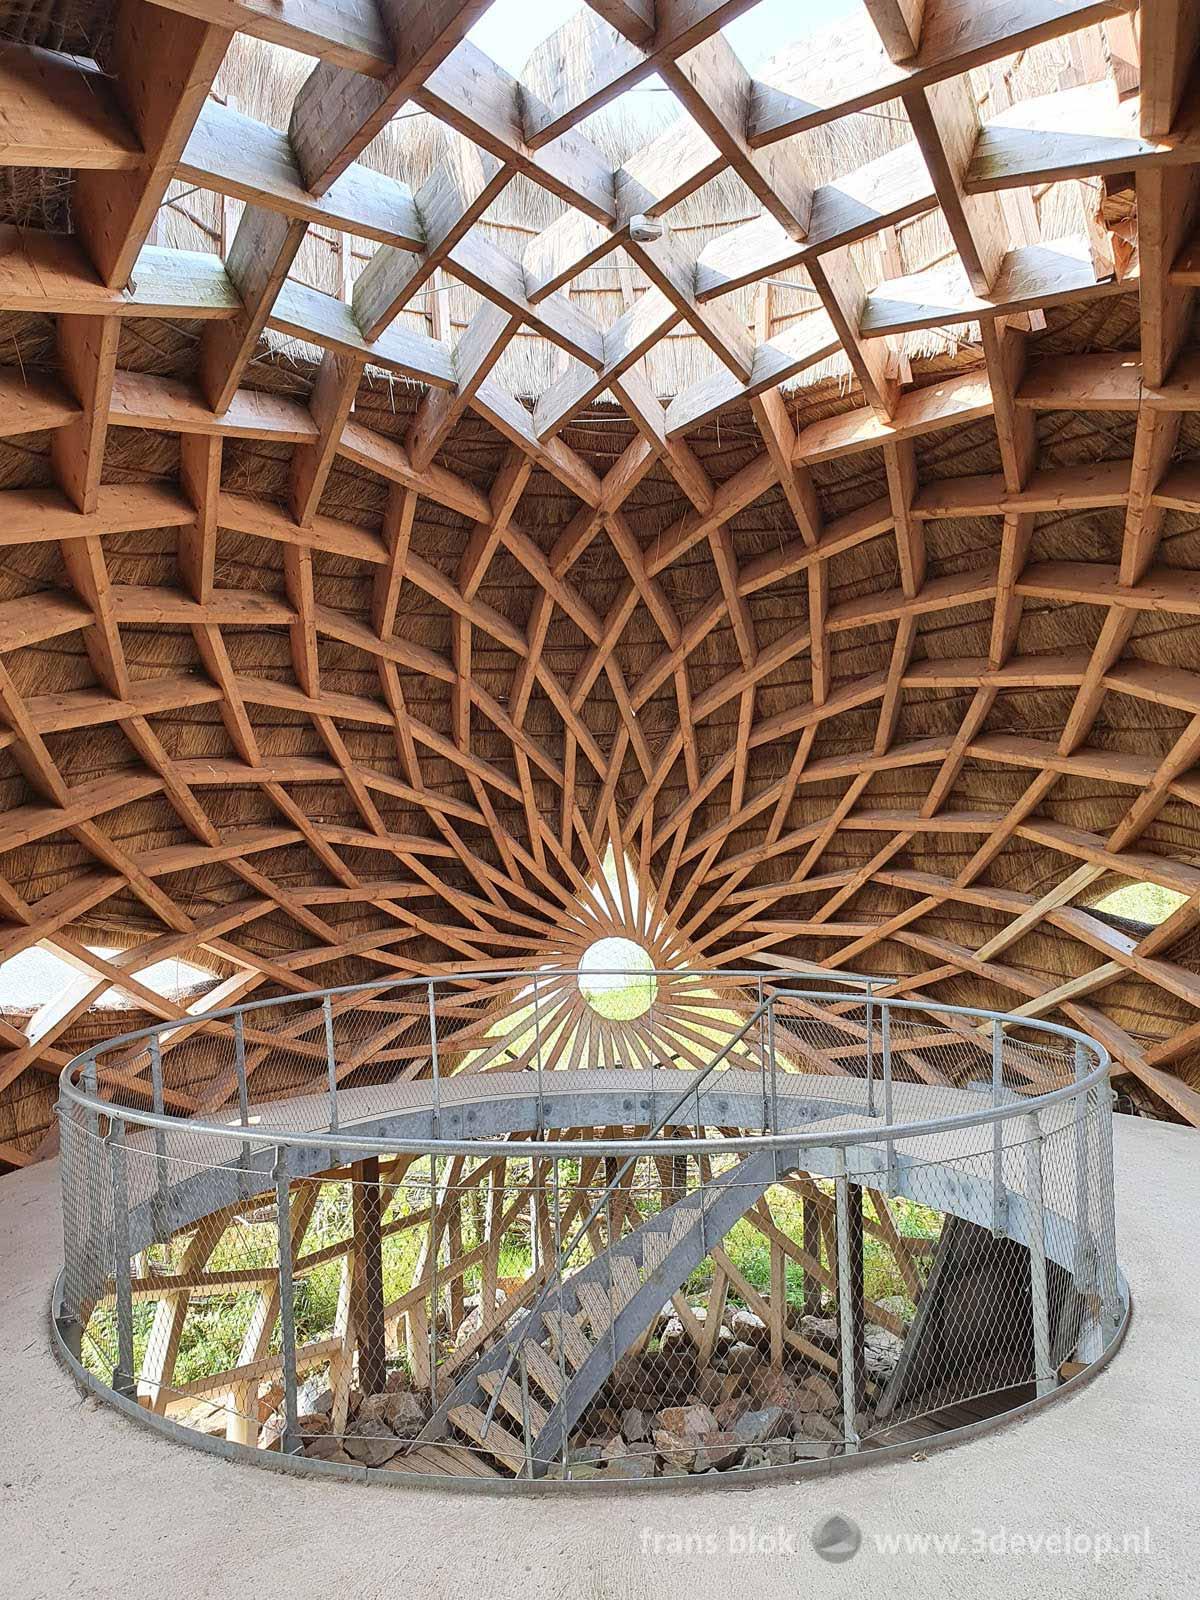 Interior of the archutectural bird observatory Tij near Haringvliet estuary in Stellendam, The Netherlands